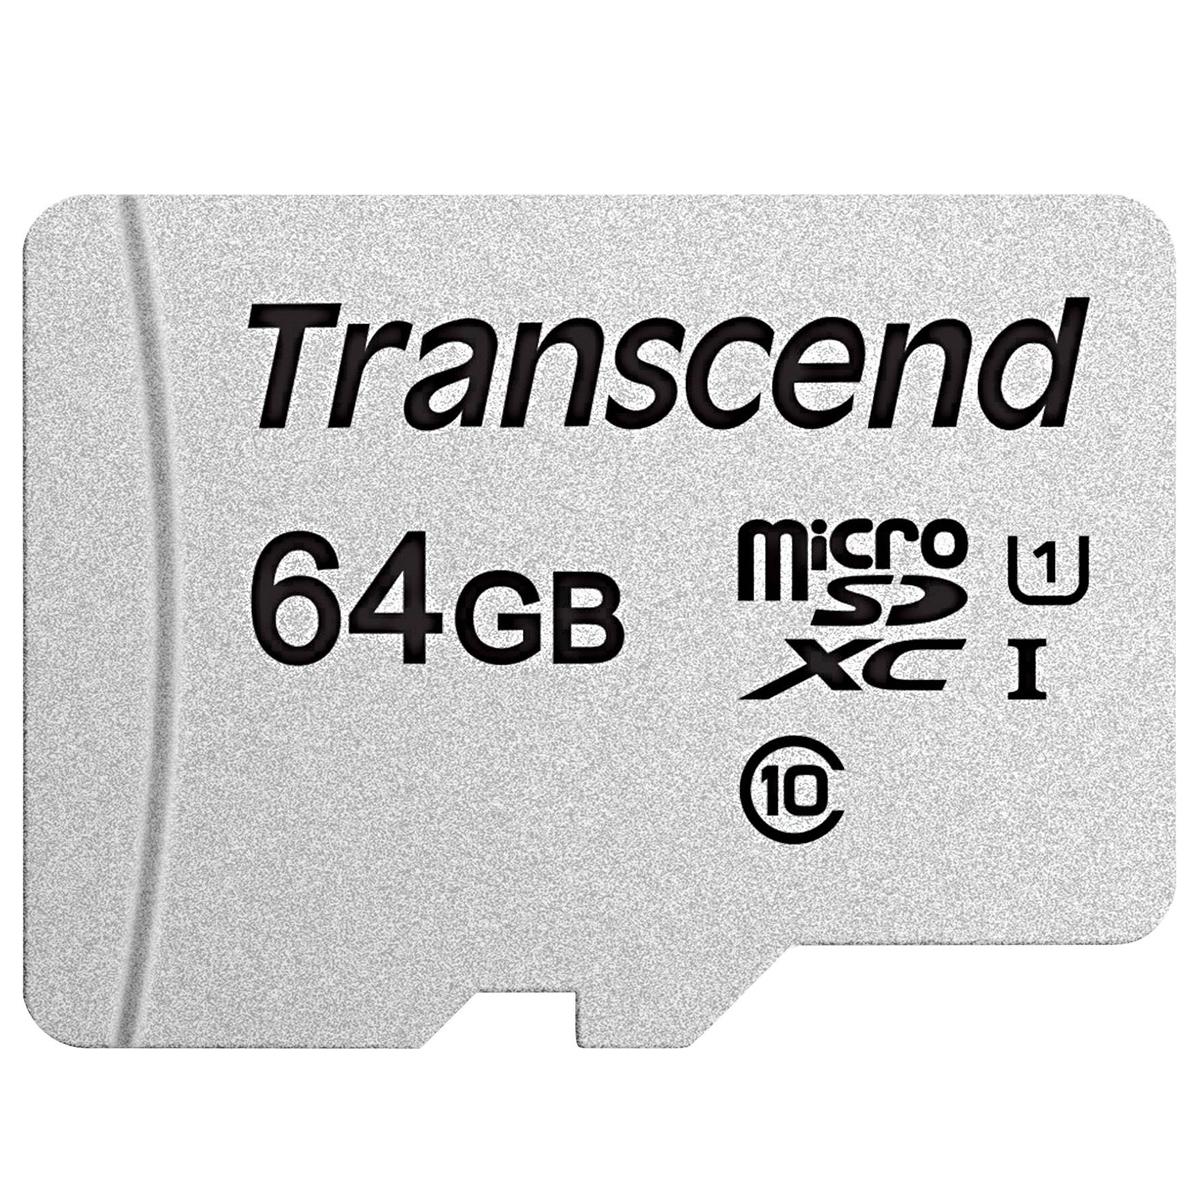 microSDXC Card 64GB, Speicherkarte